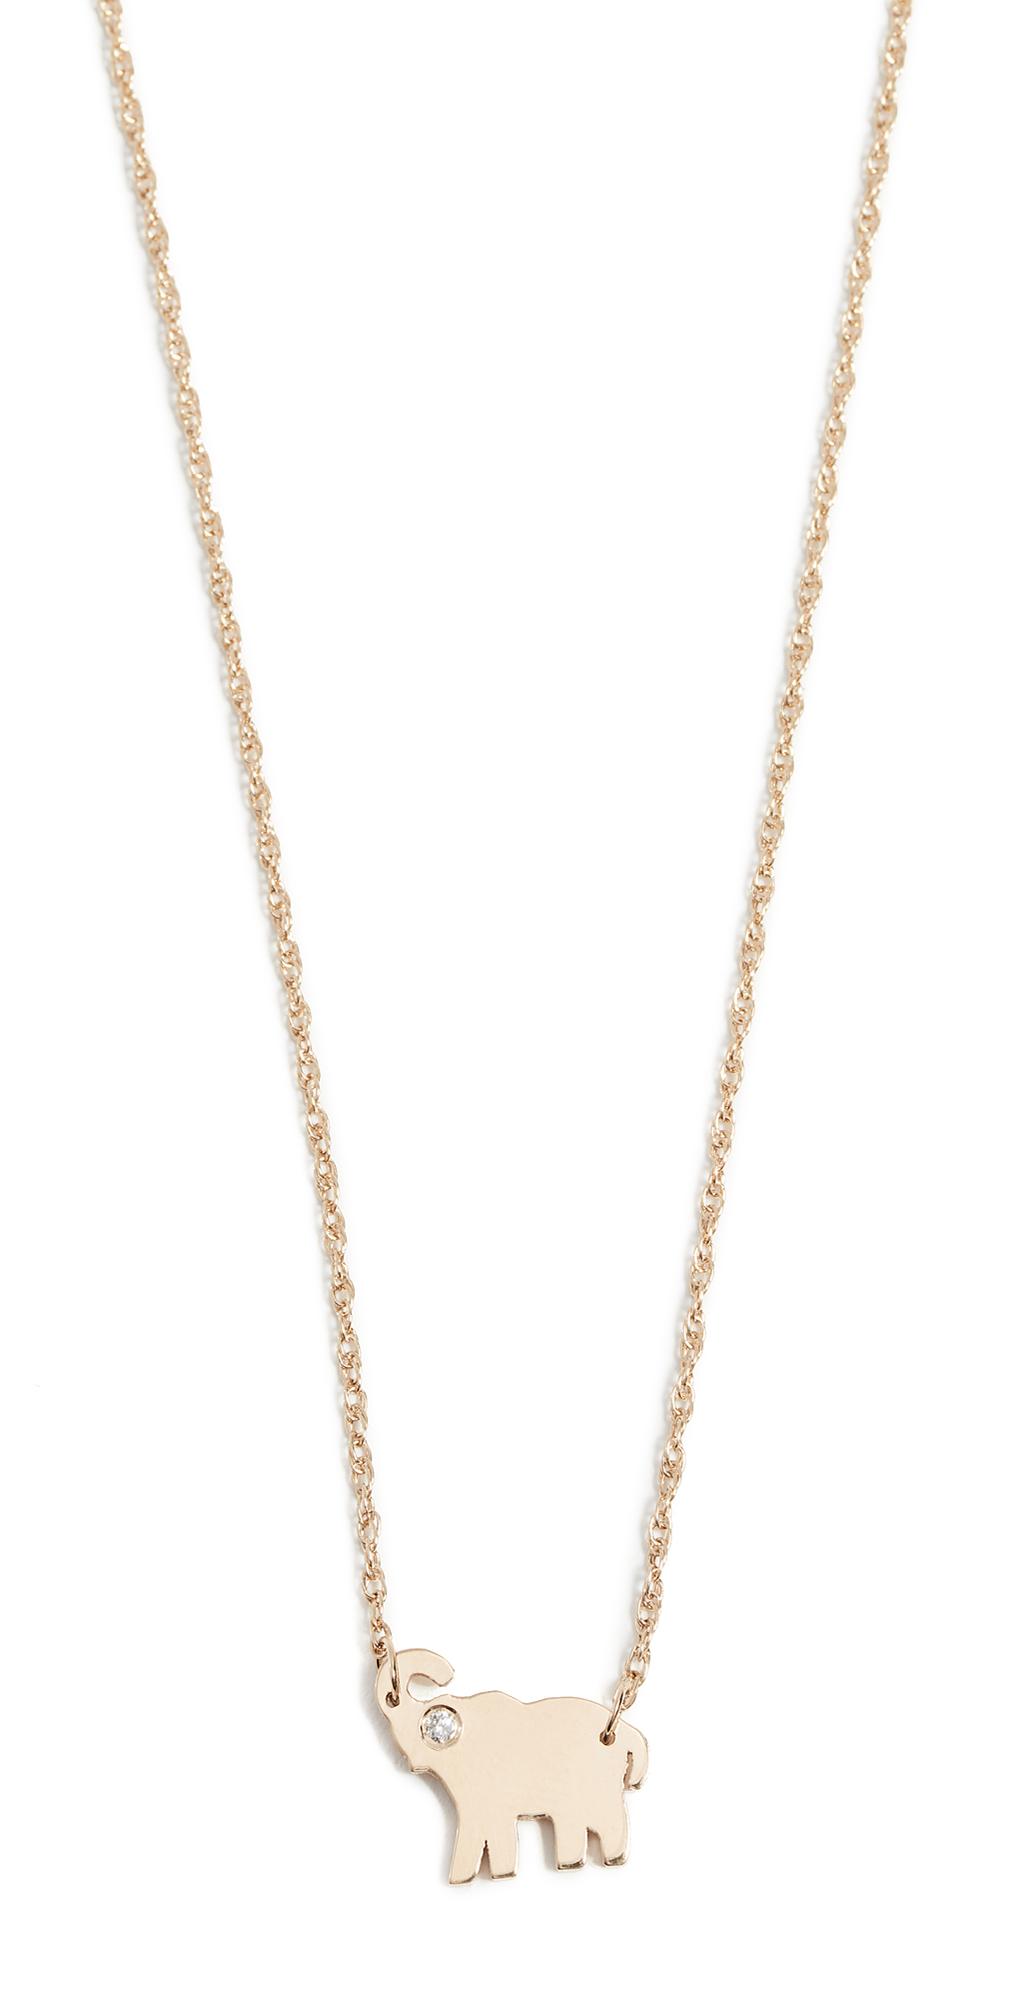 Mini Elephant Necklace with Diamond